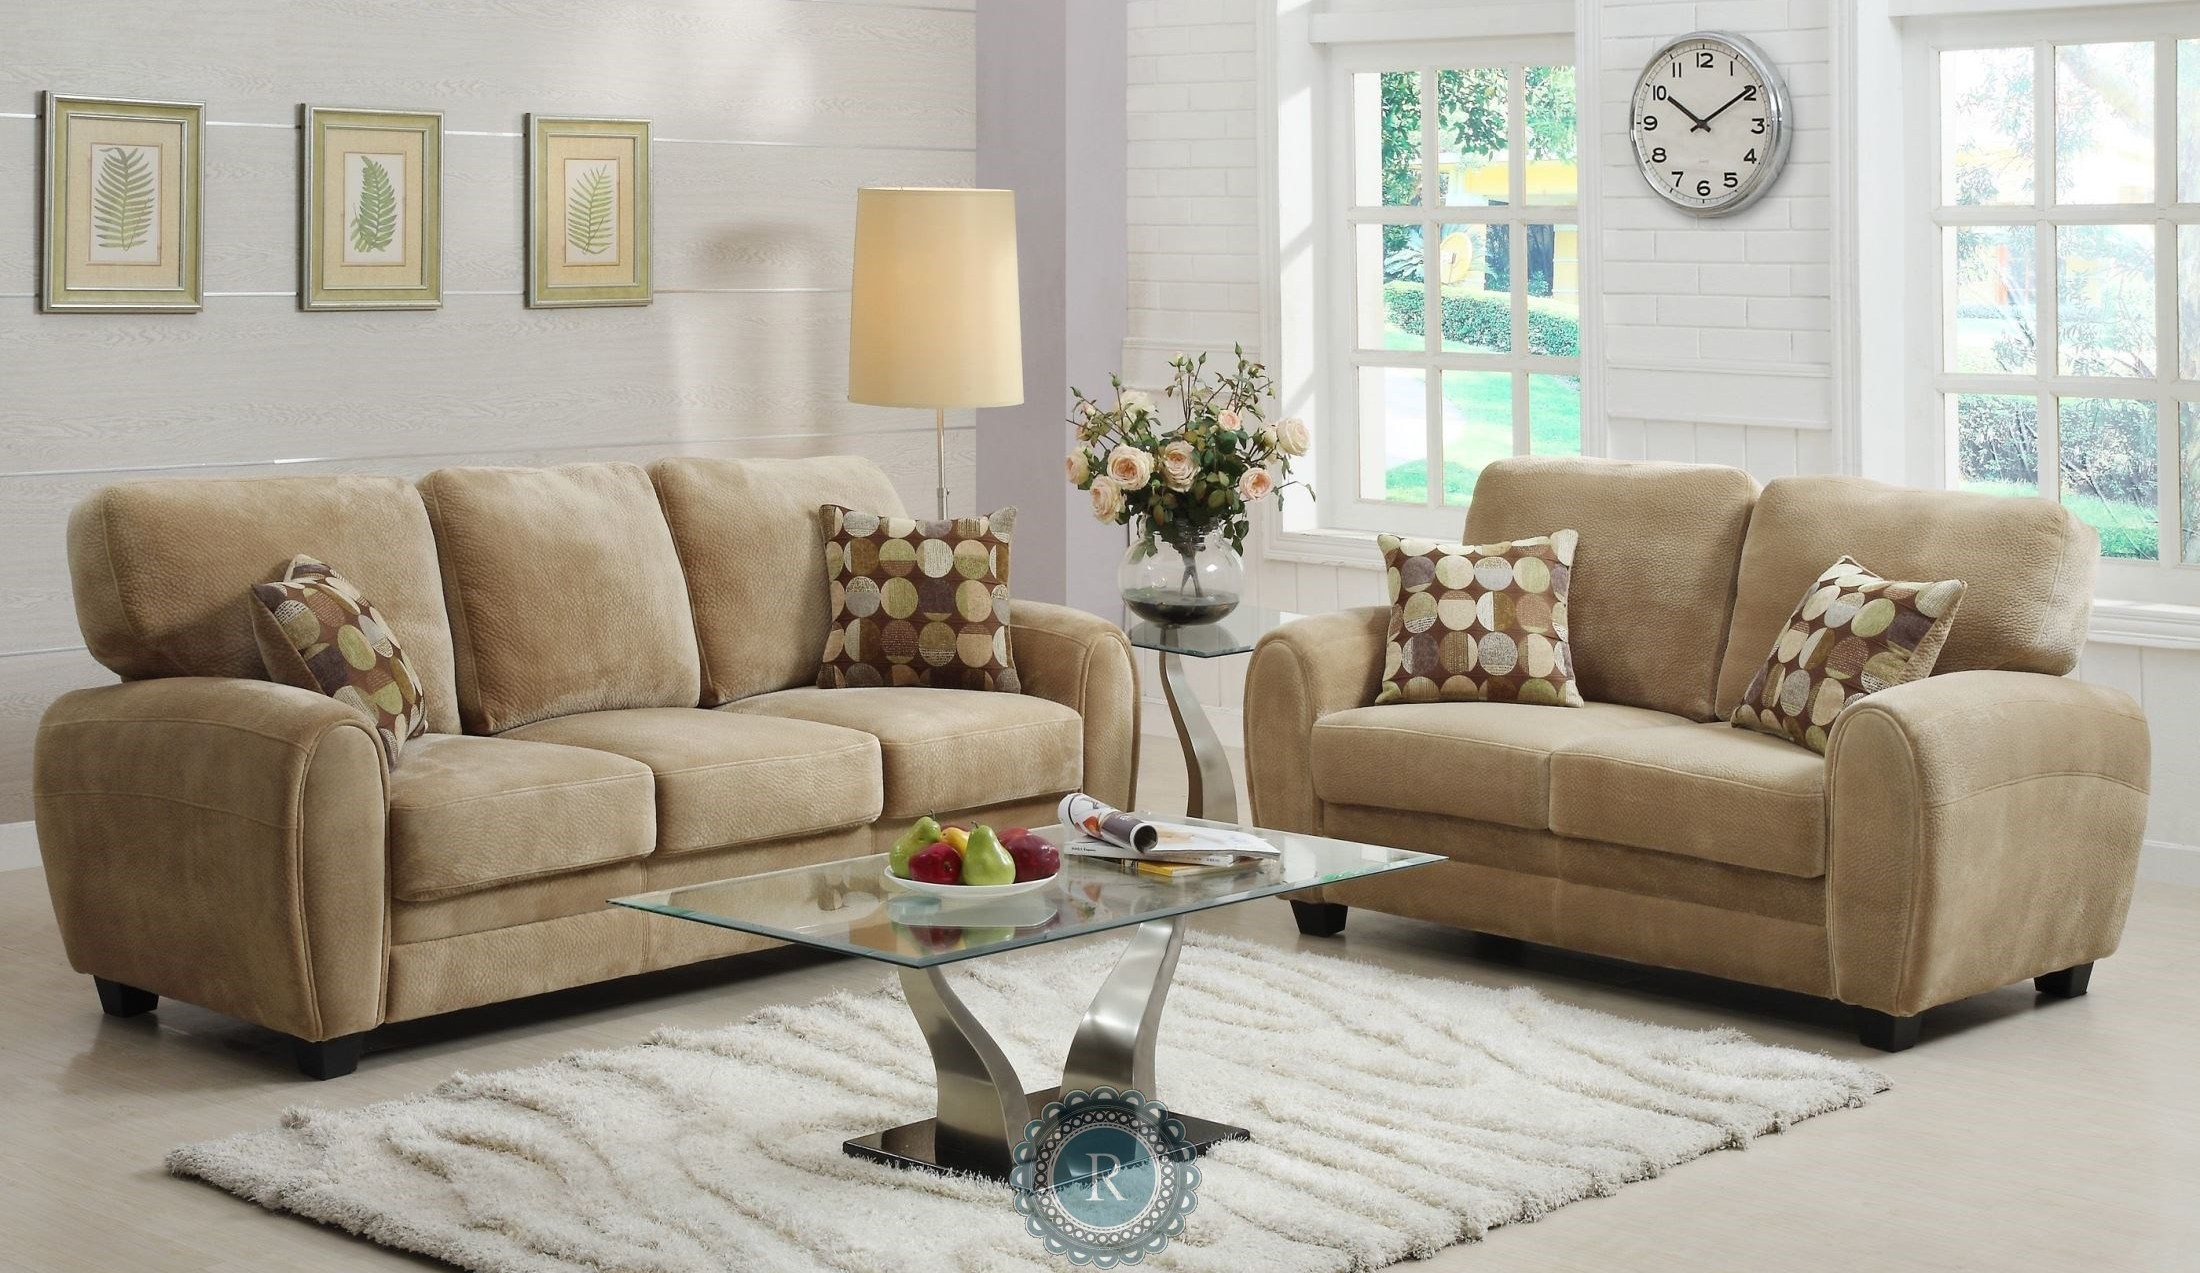 Rubin brown living room set from homelegance 9734br 3 2 for Brown living room set